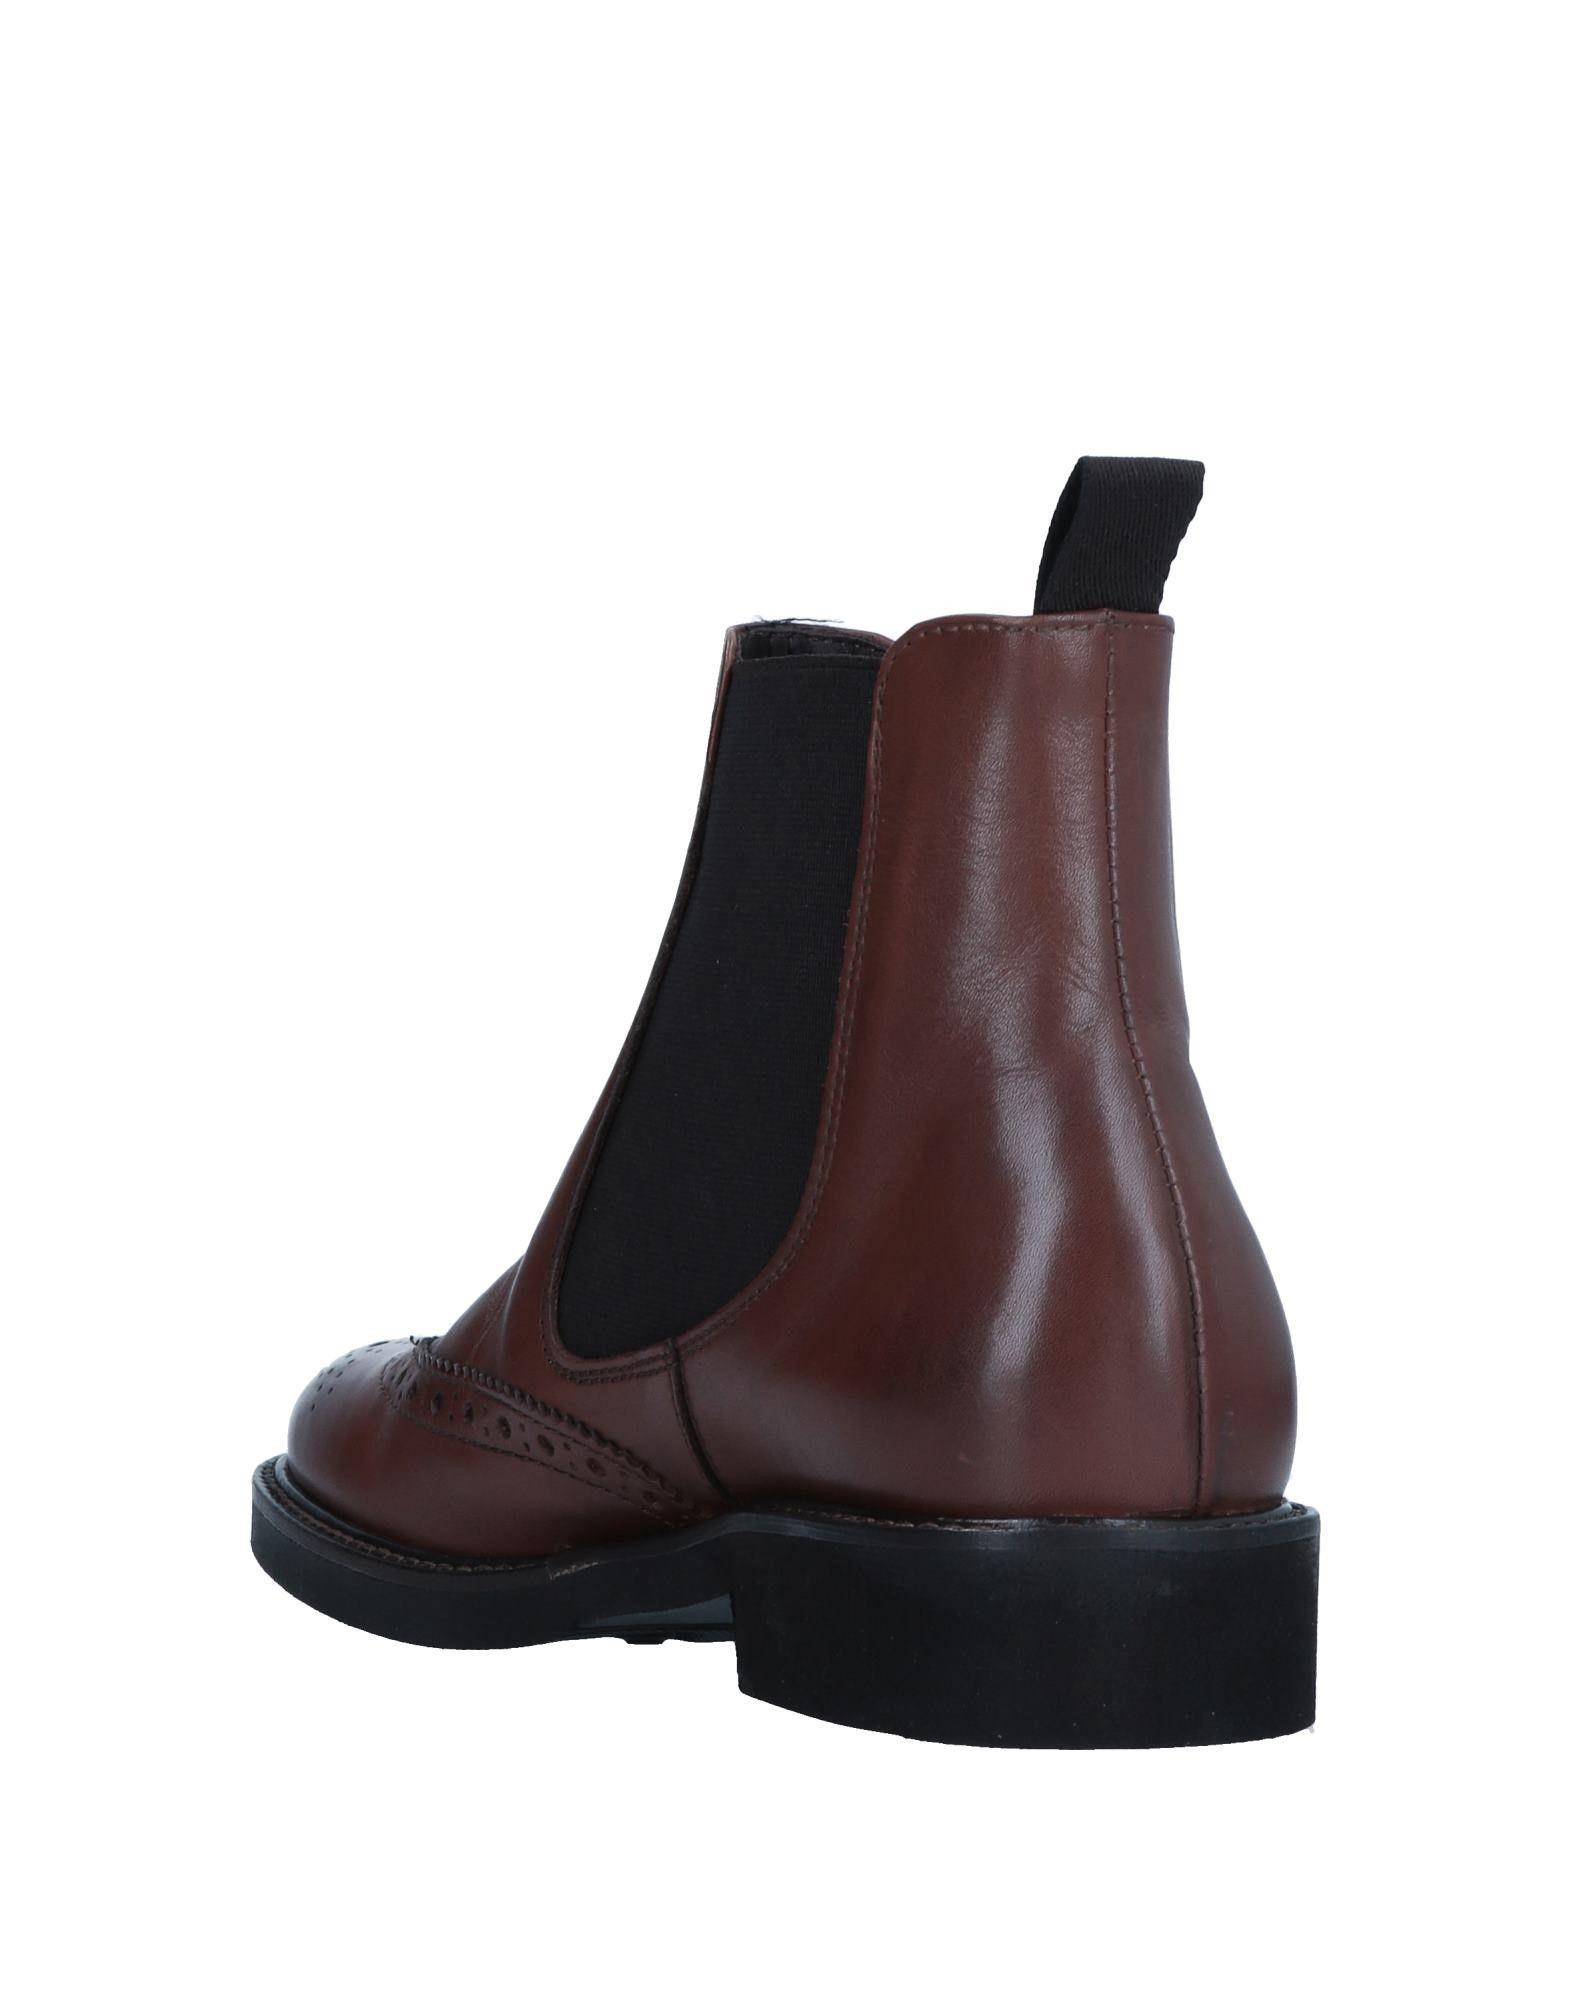 Andrea Morando Gute Chelsea Stiefel Damen 11525118VL Gute Morando Qualität beliebte Schuhe 52e6b5